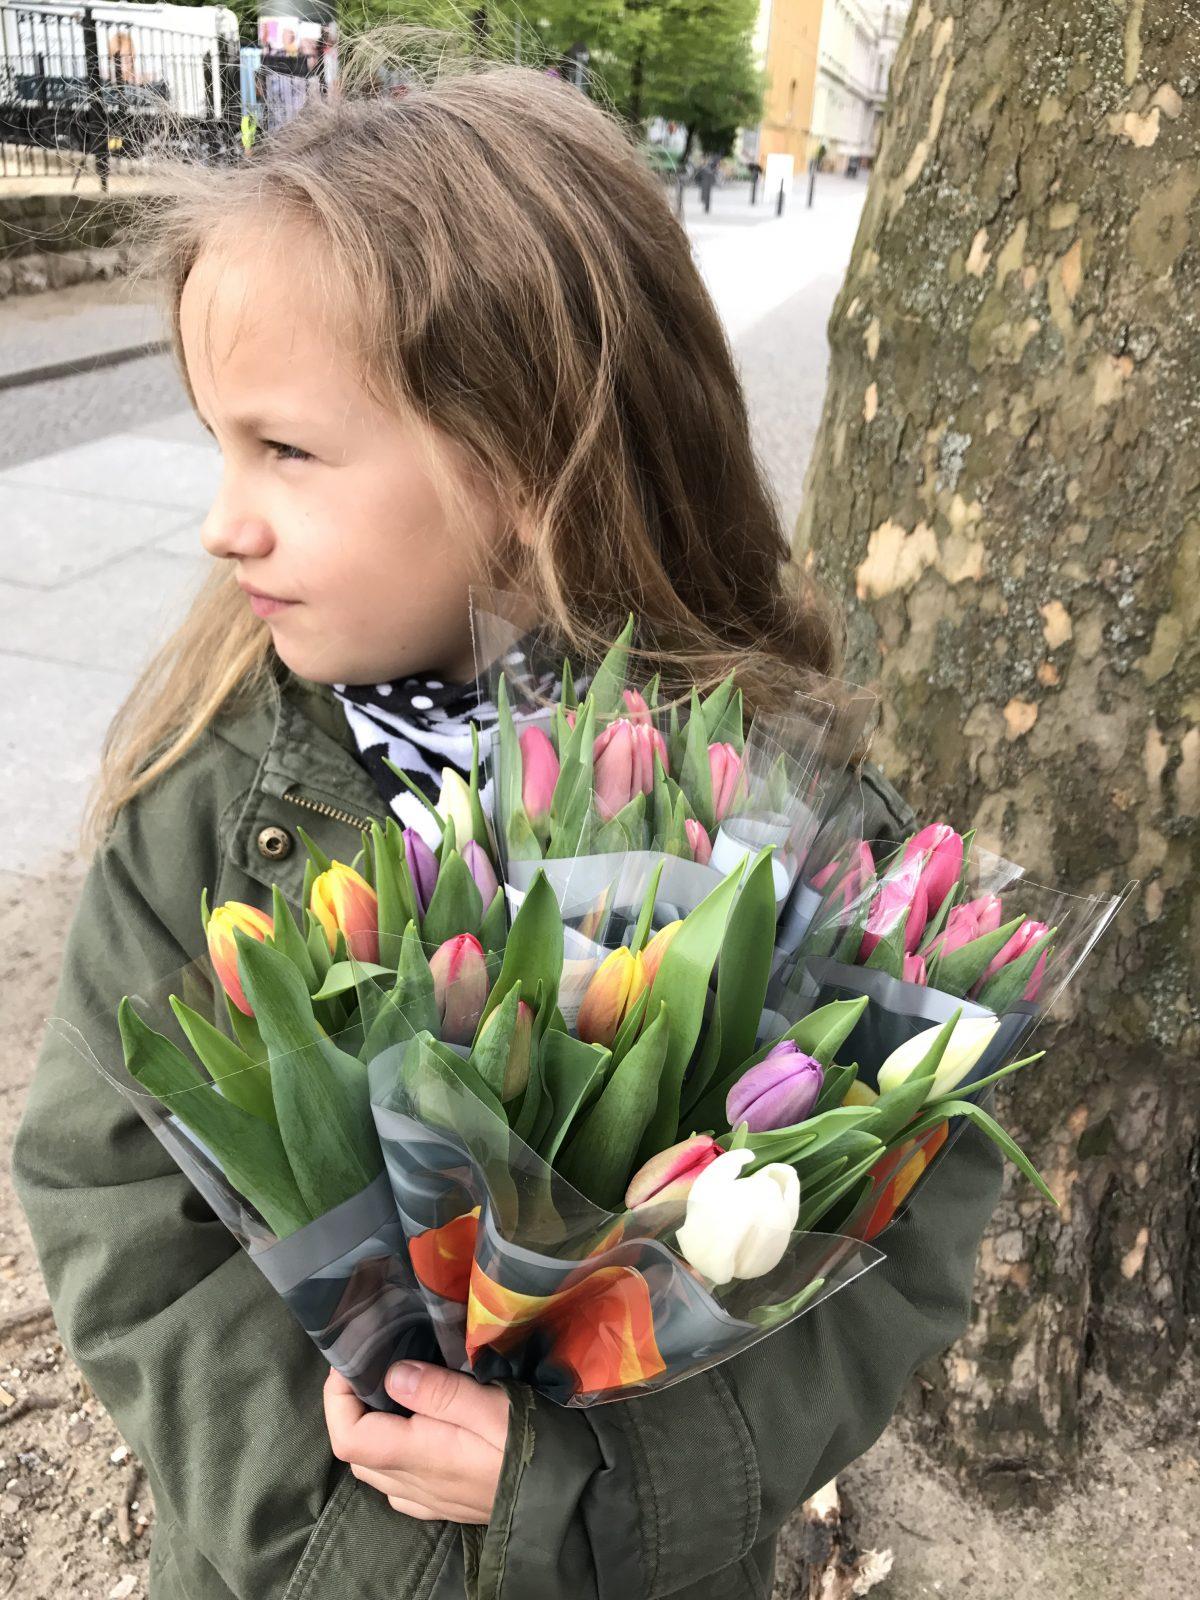 Freitagslieblinge: Goldkind mit Tulpen | Berlinmittemom.com